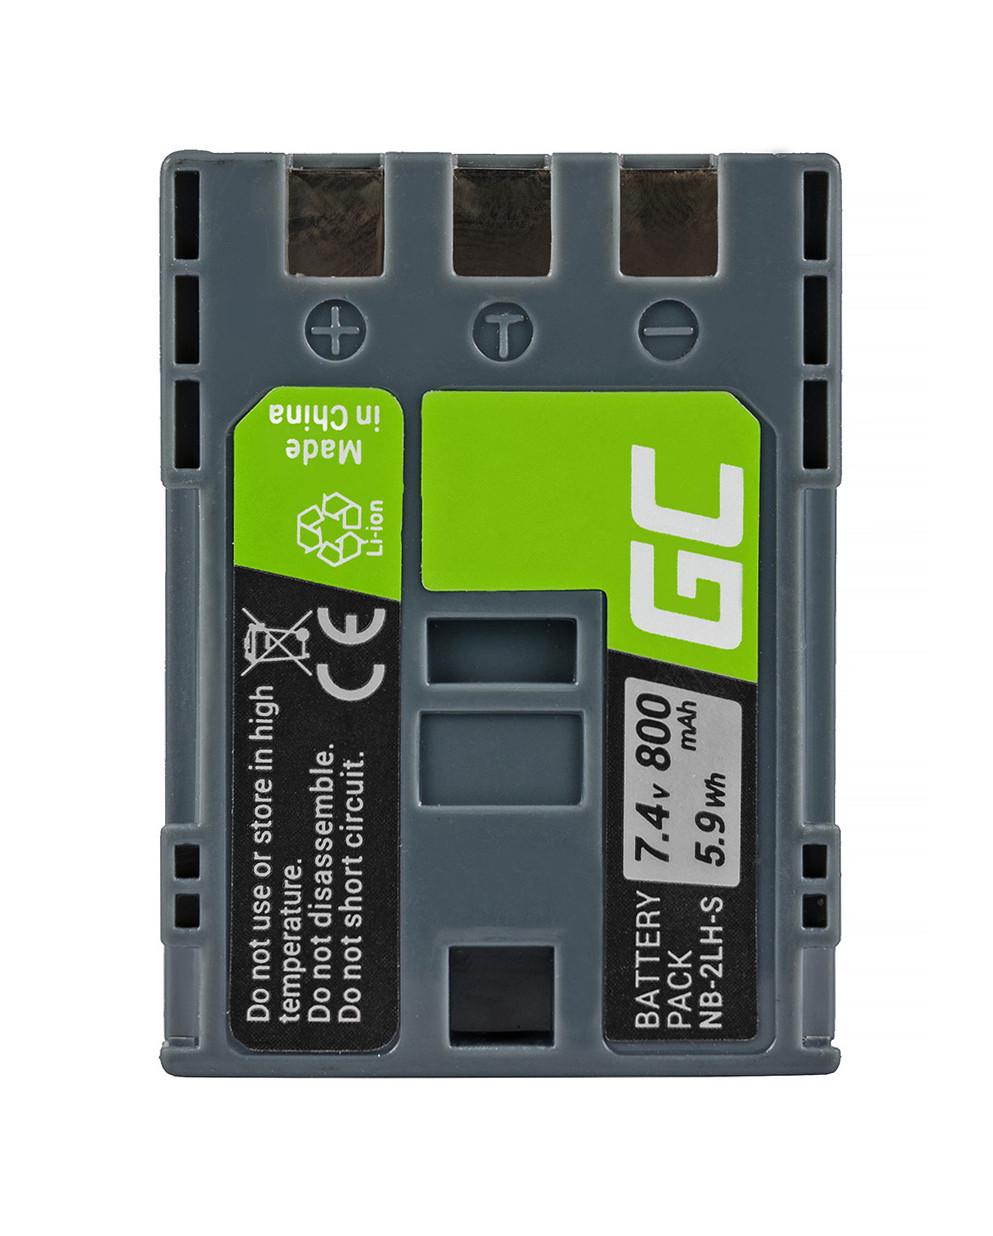 Green Cell Battery NB-2L / NB-2LH Canon PowerShot G7 G9 S70 S80 R100 R11 Canon Elura 85 90 EOS 350D 400D 7.4V 700mAh